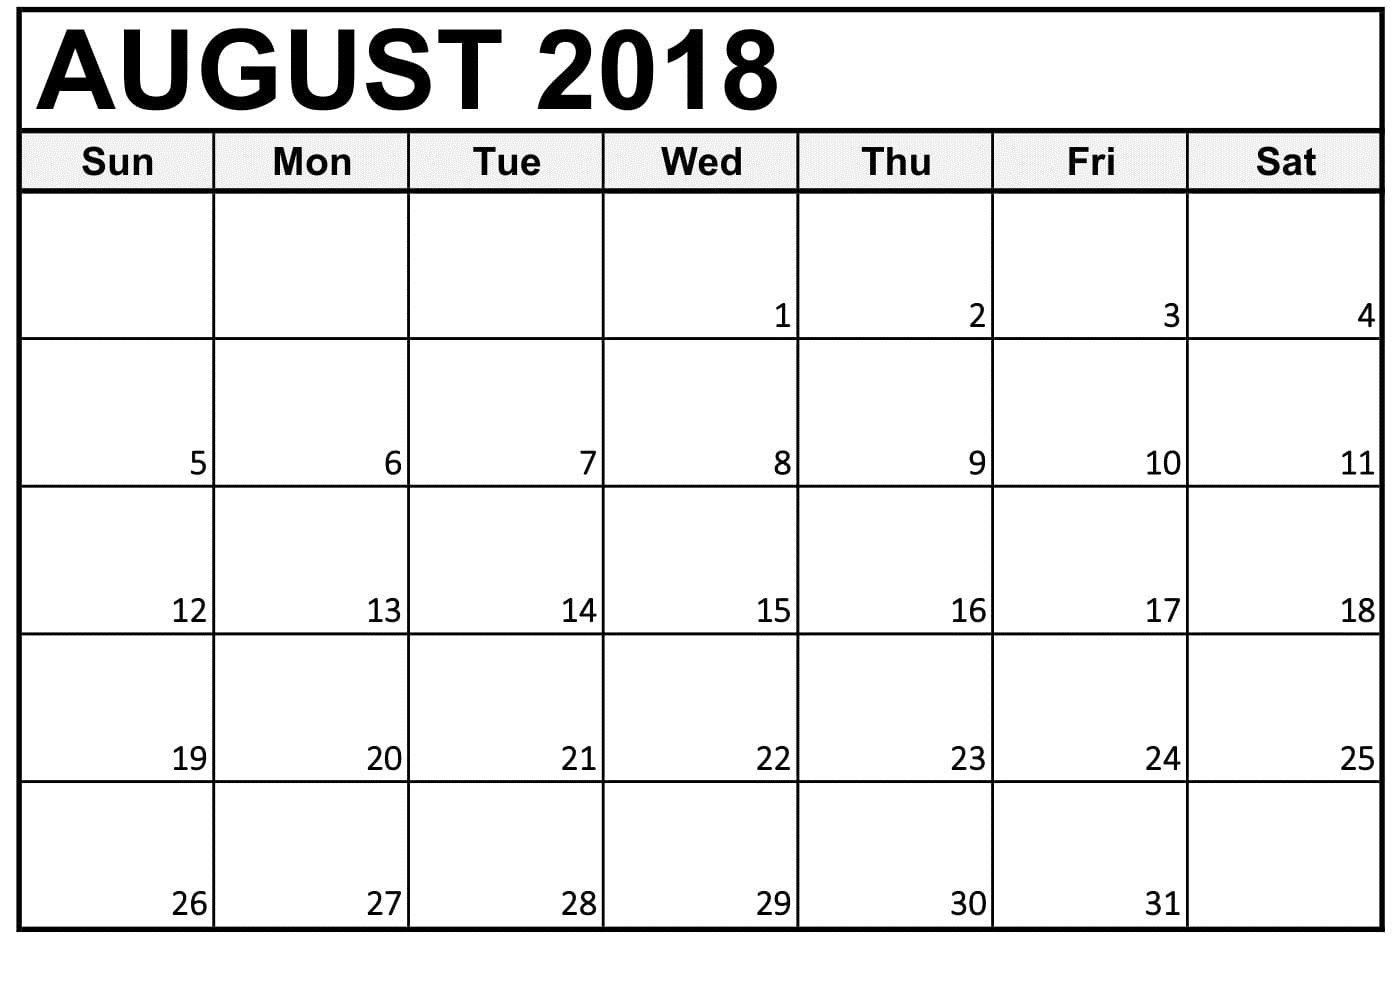 Printable Calendar August 2018 With Week Day   Printable 8 Week Calendar Printable